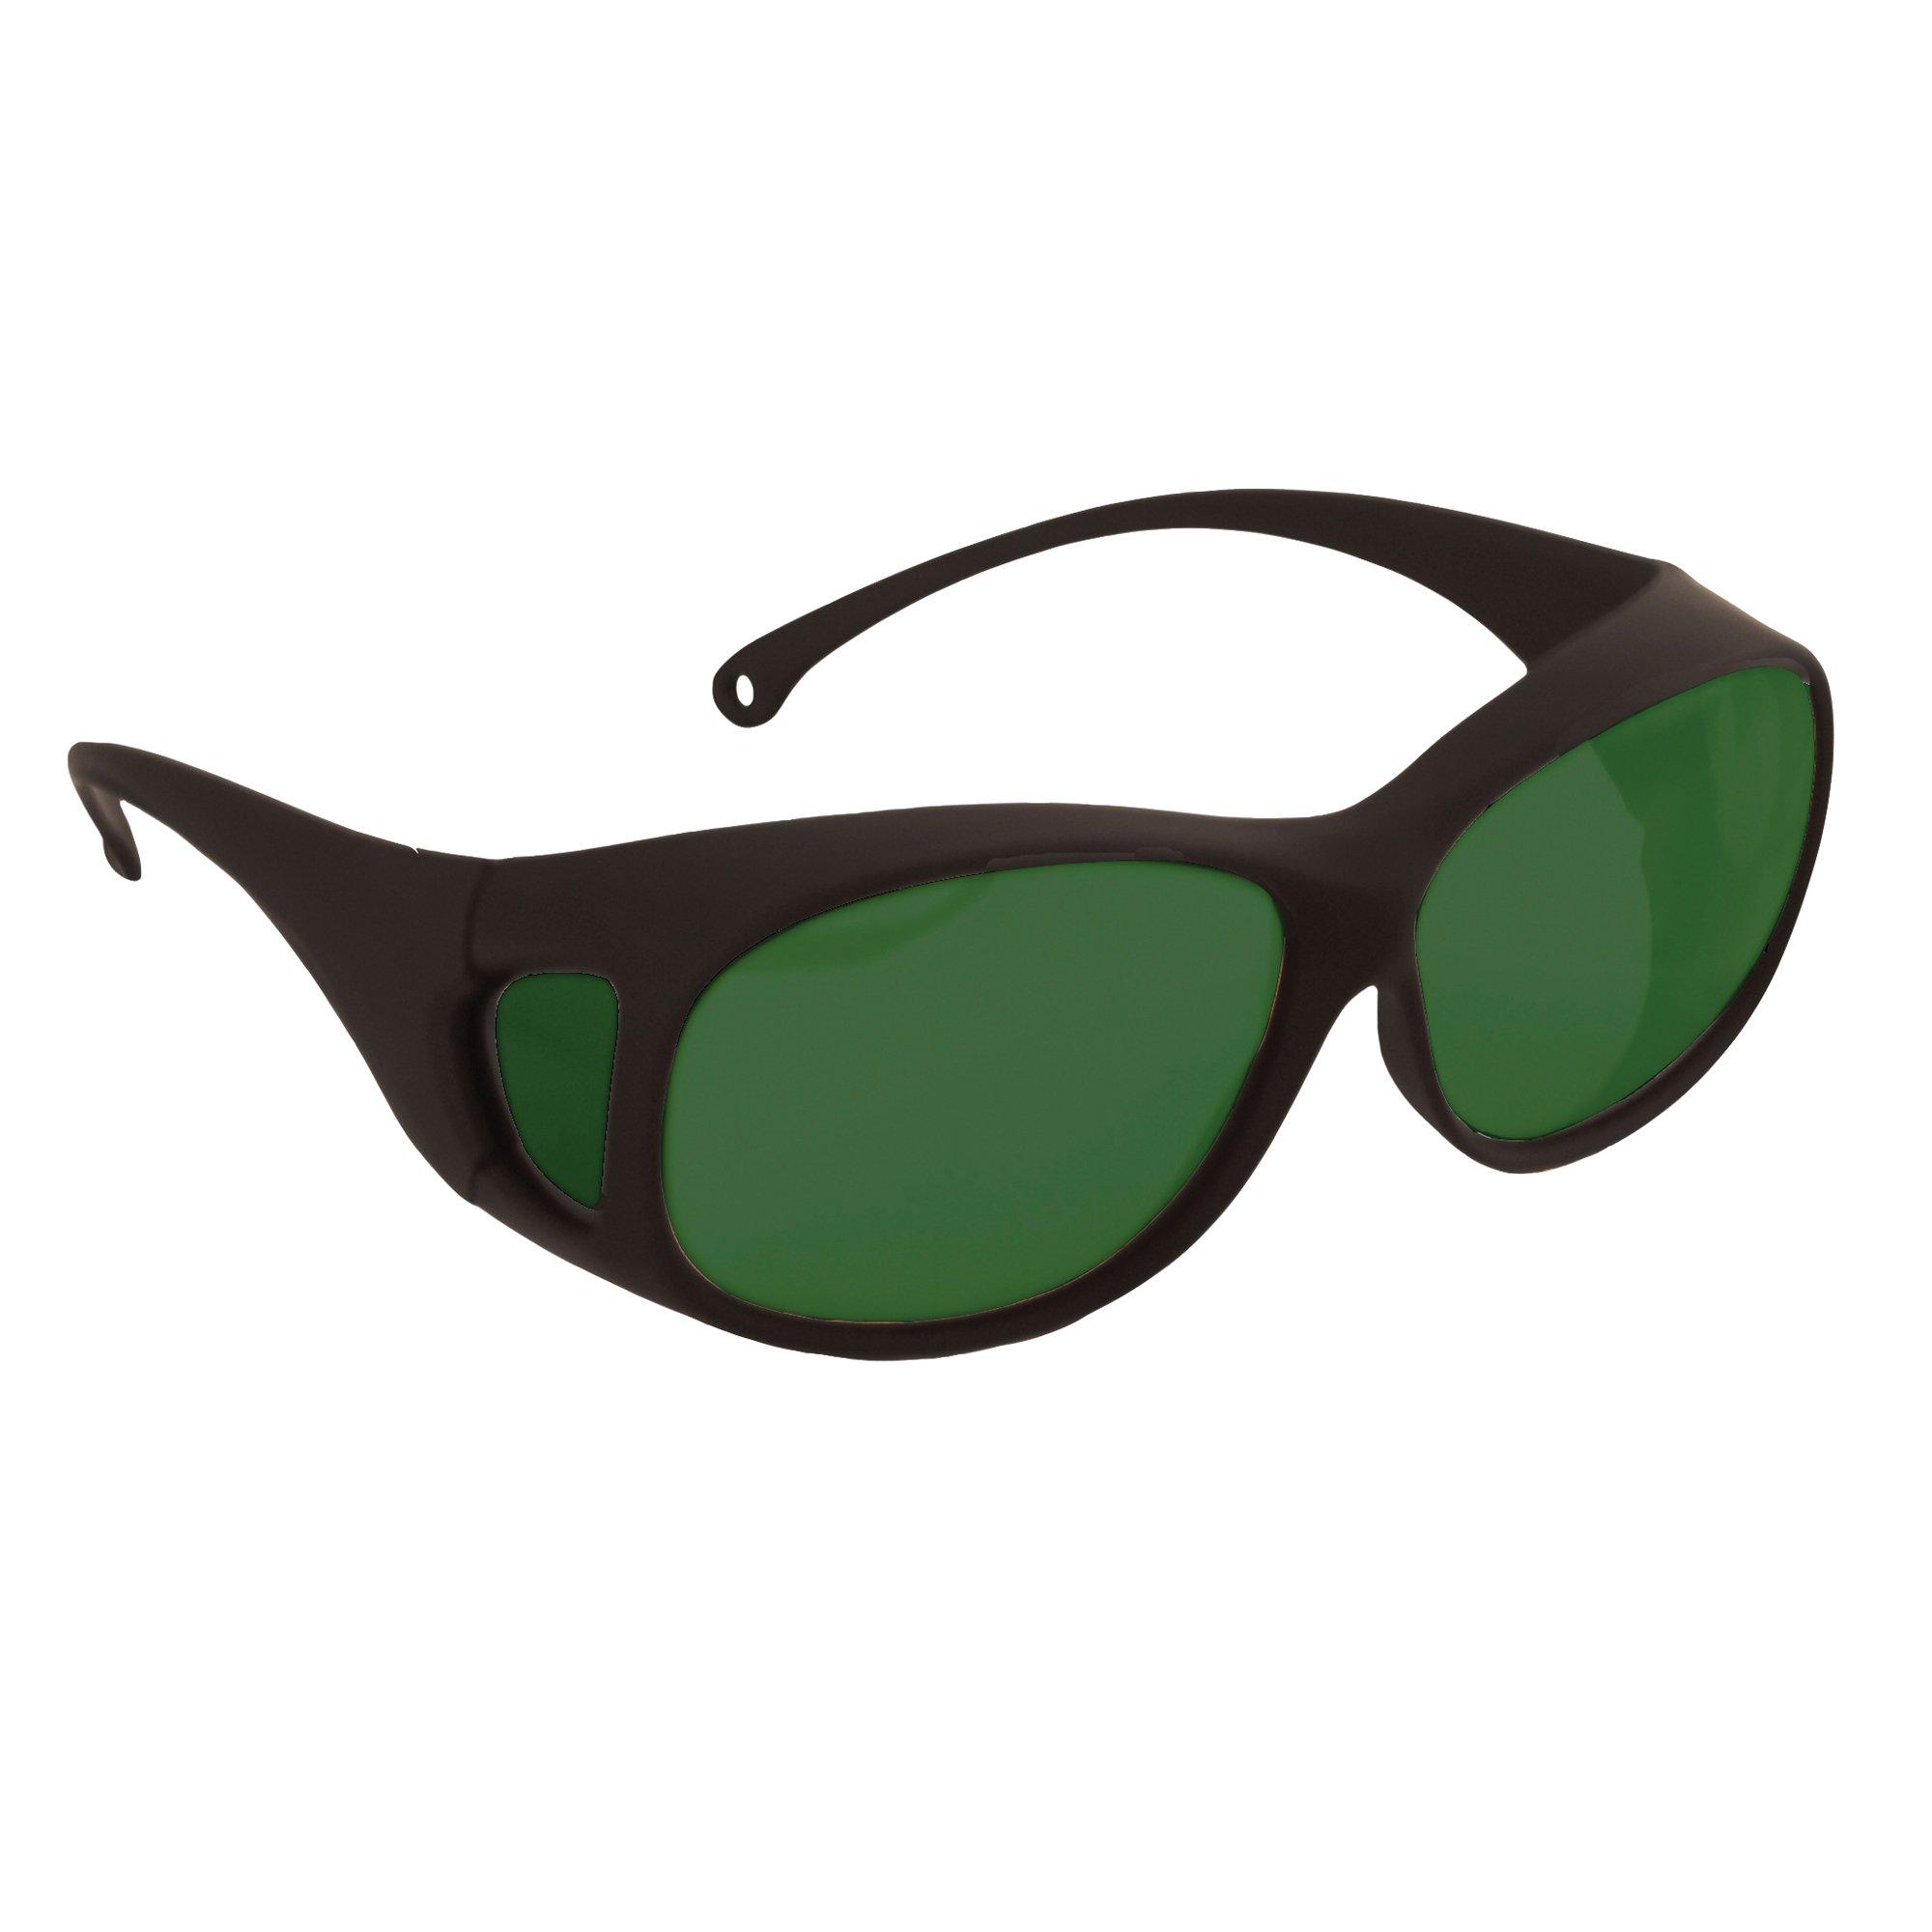 Jackson Safety OTG Safety Glasses (21917), Fits Over Readers, IRUV Shade 5.0 Lenses, Black Frame, Pack of 12